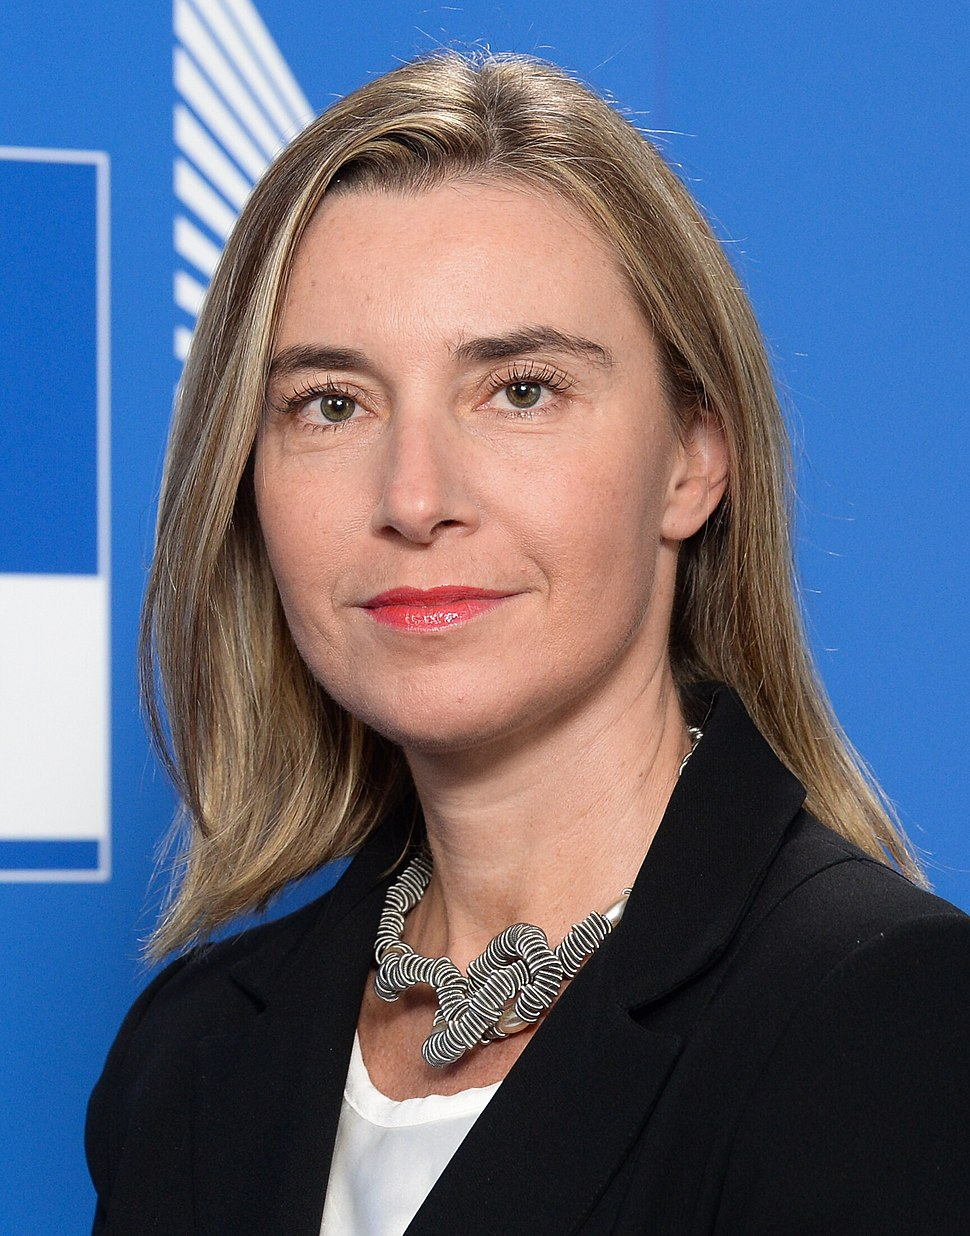 Federica Mogherini Official